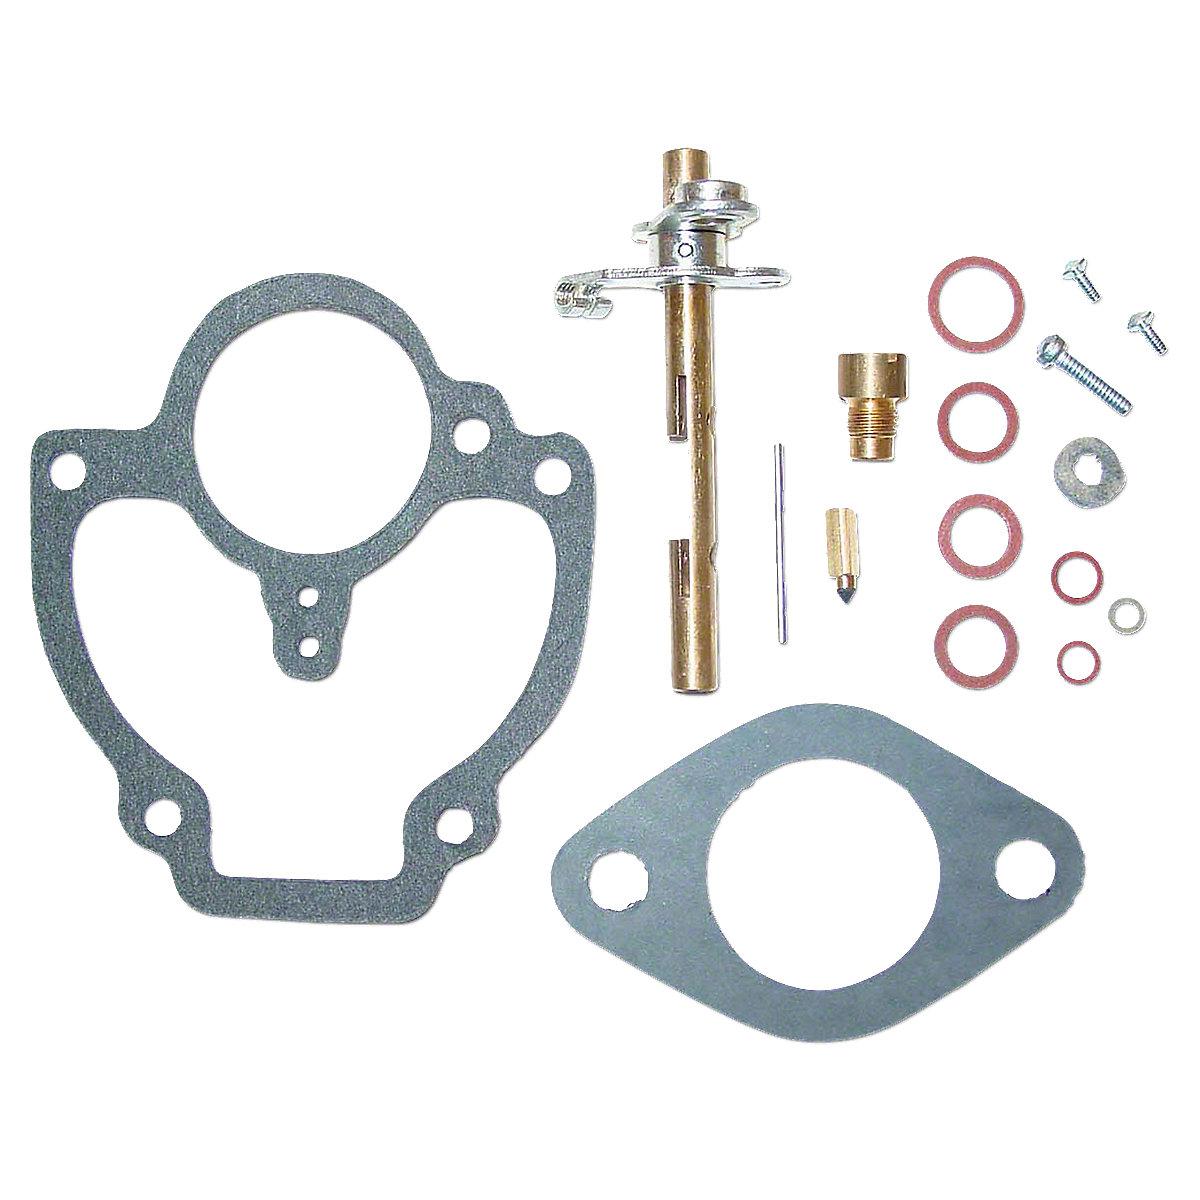 Zenith Basic Carburetor Rebuild Kit For Massey Harris: 101 Jr, 102 Jr, 44, 44 Special, 44-6, 203, 444, 55, 555.